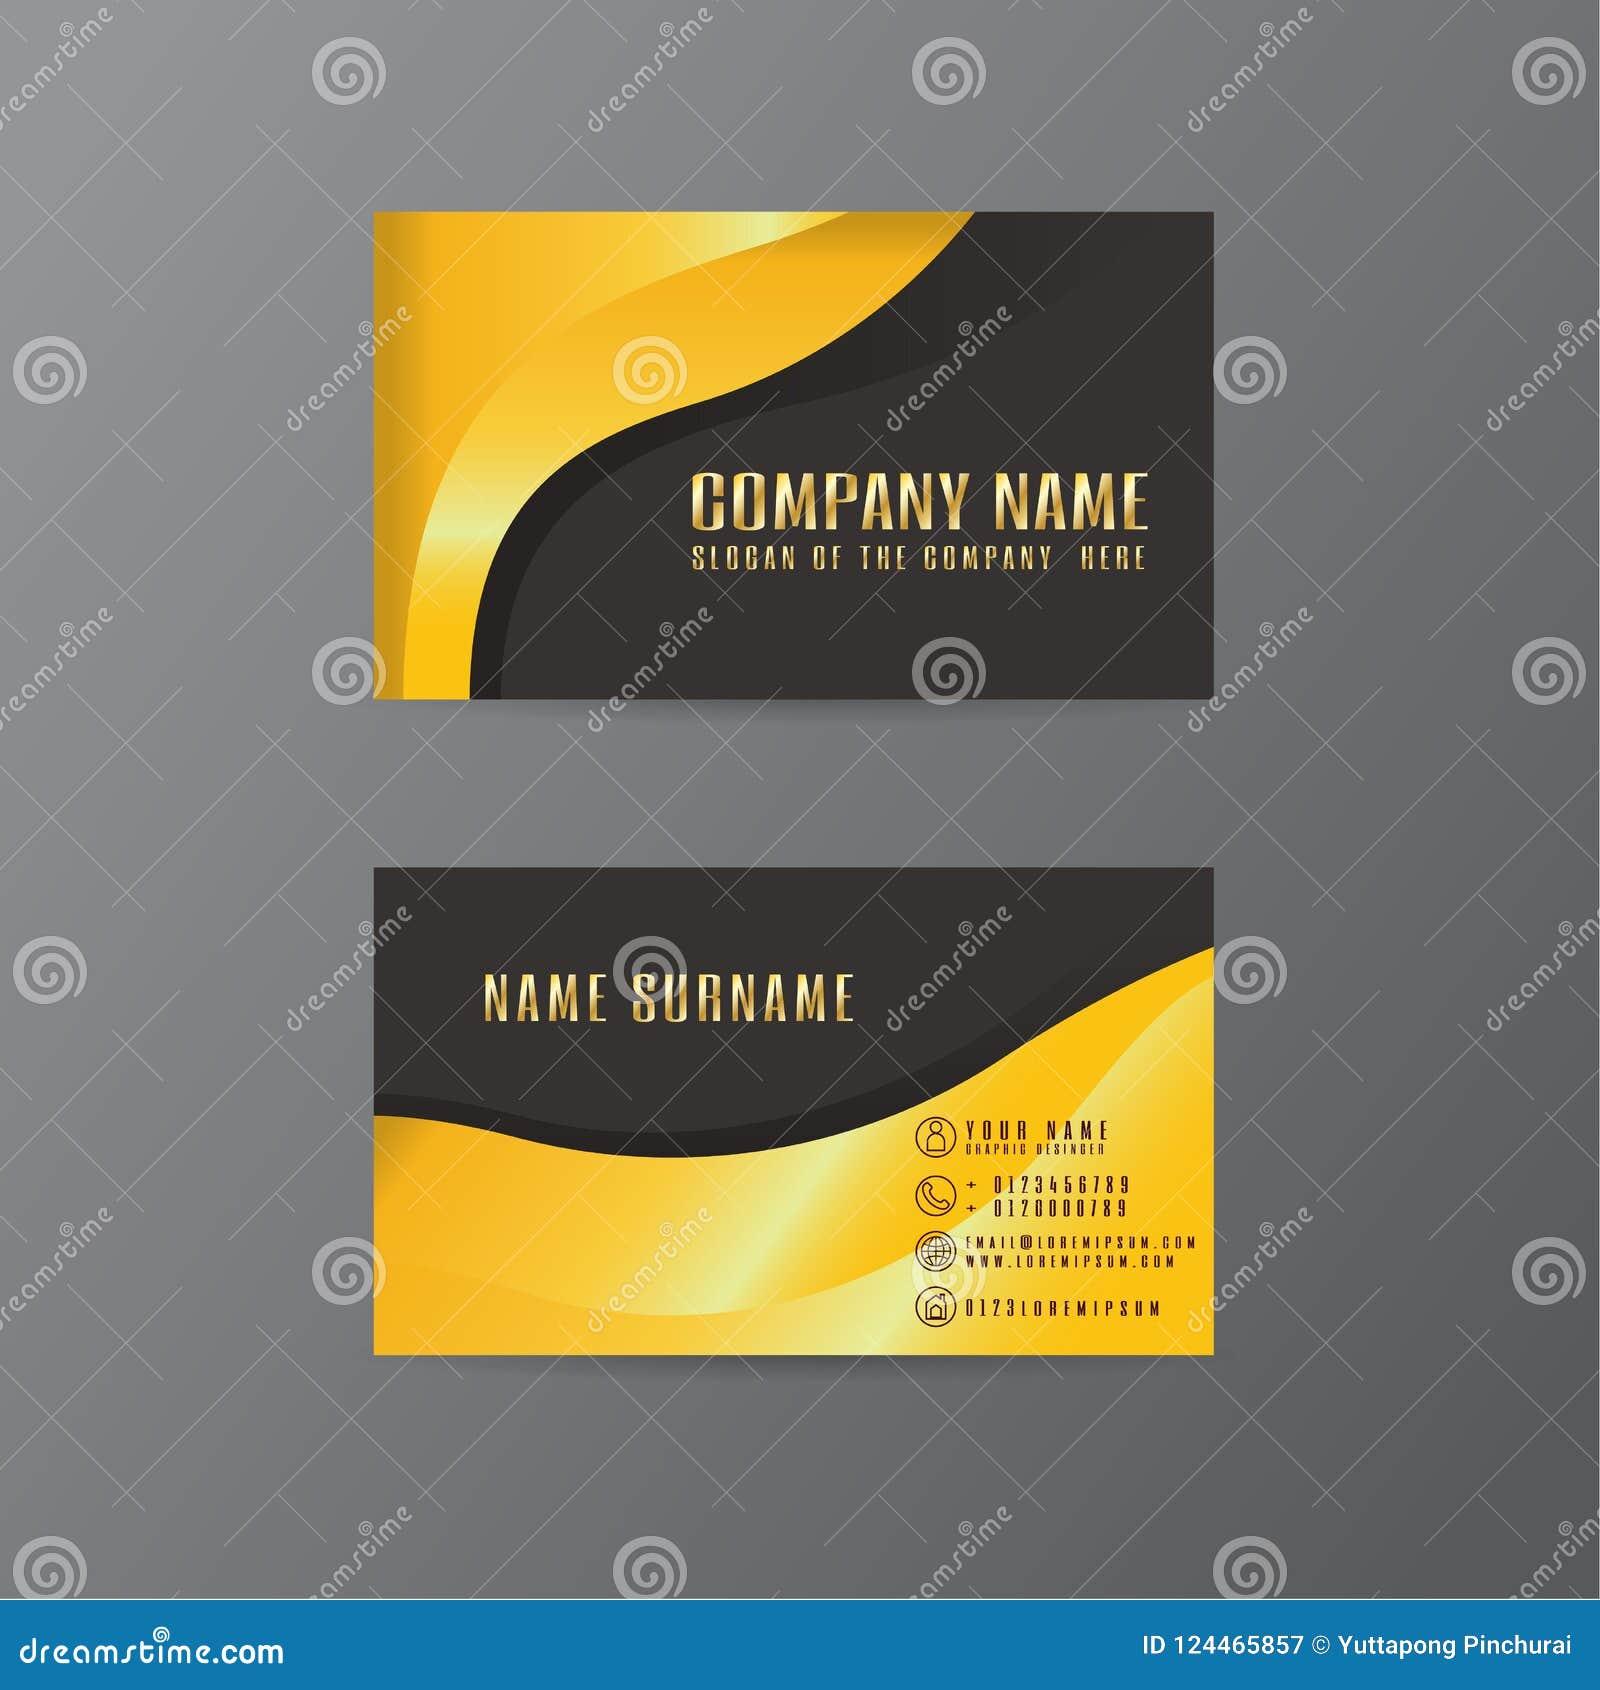 Vector creative leaf business card gold and black design of text download vector creative leaf business card gold and black design of text stock vector illustration colourmoves